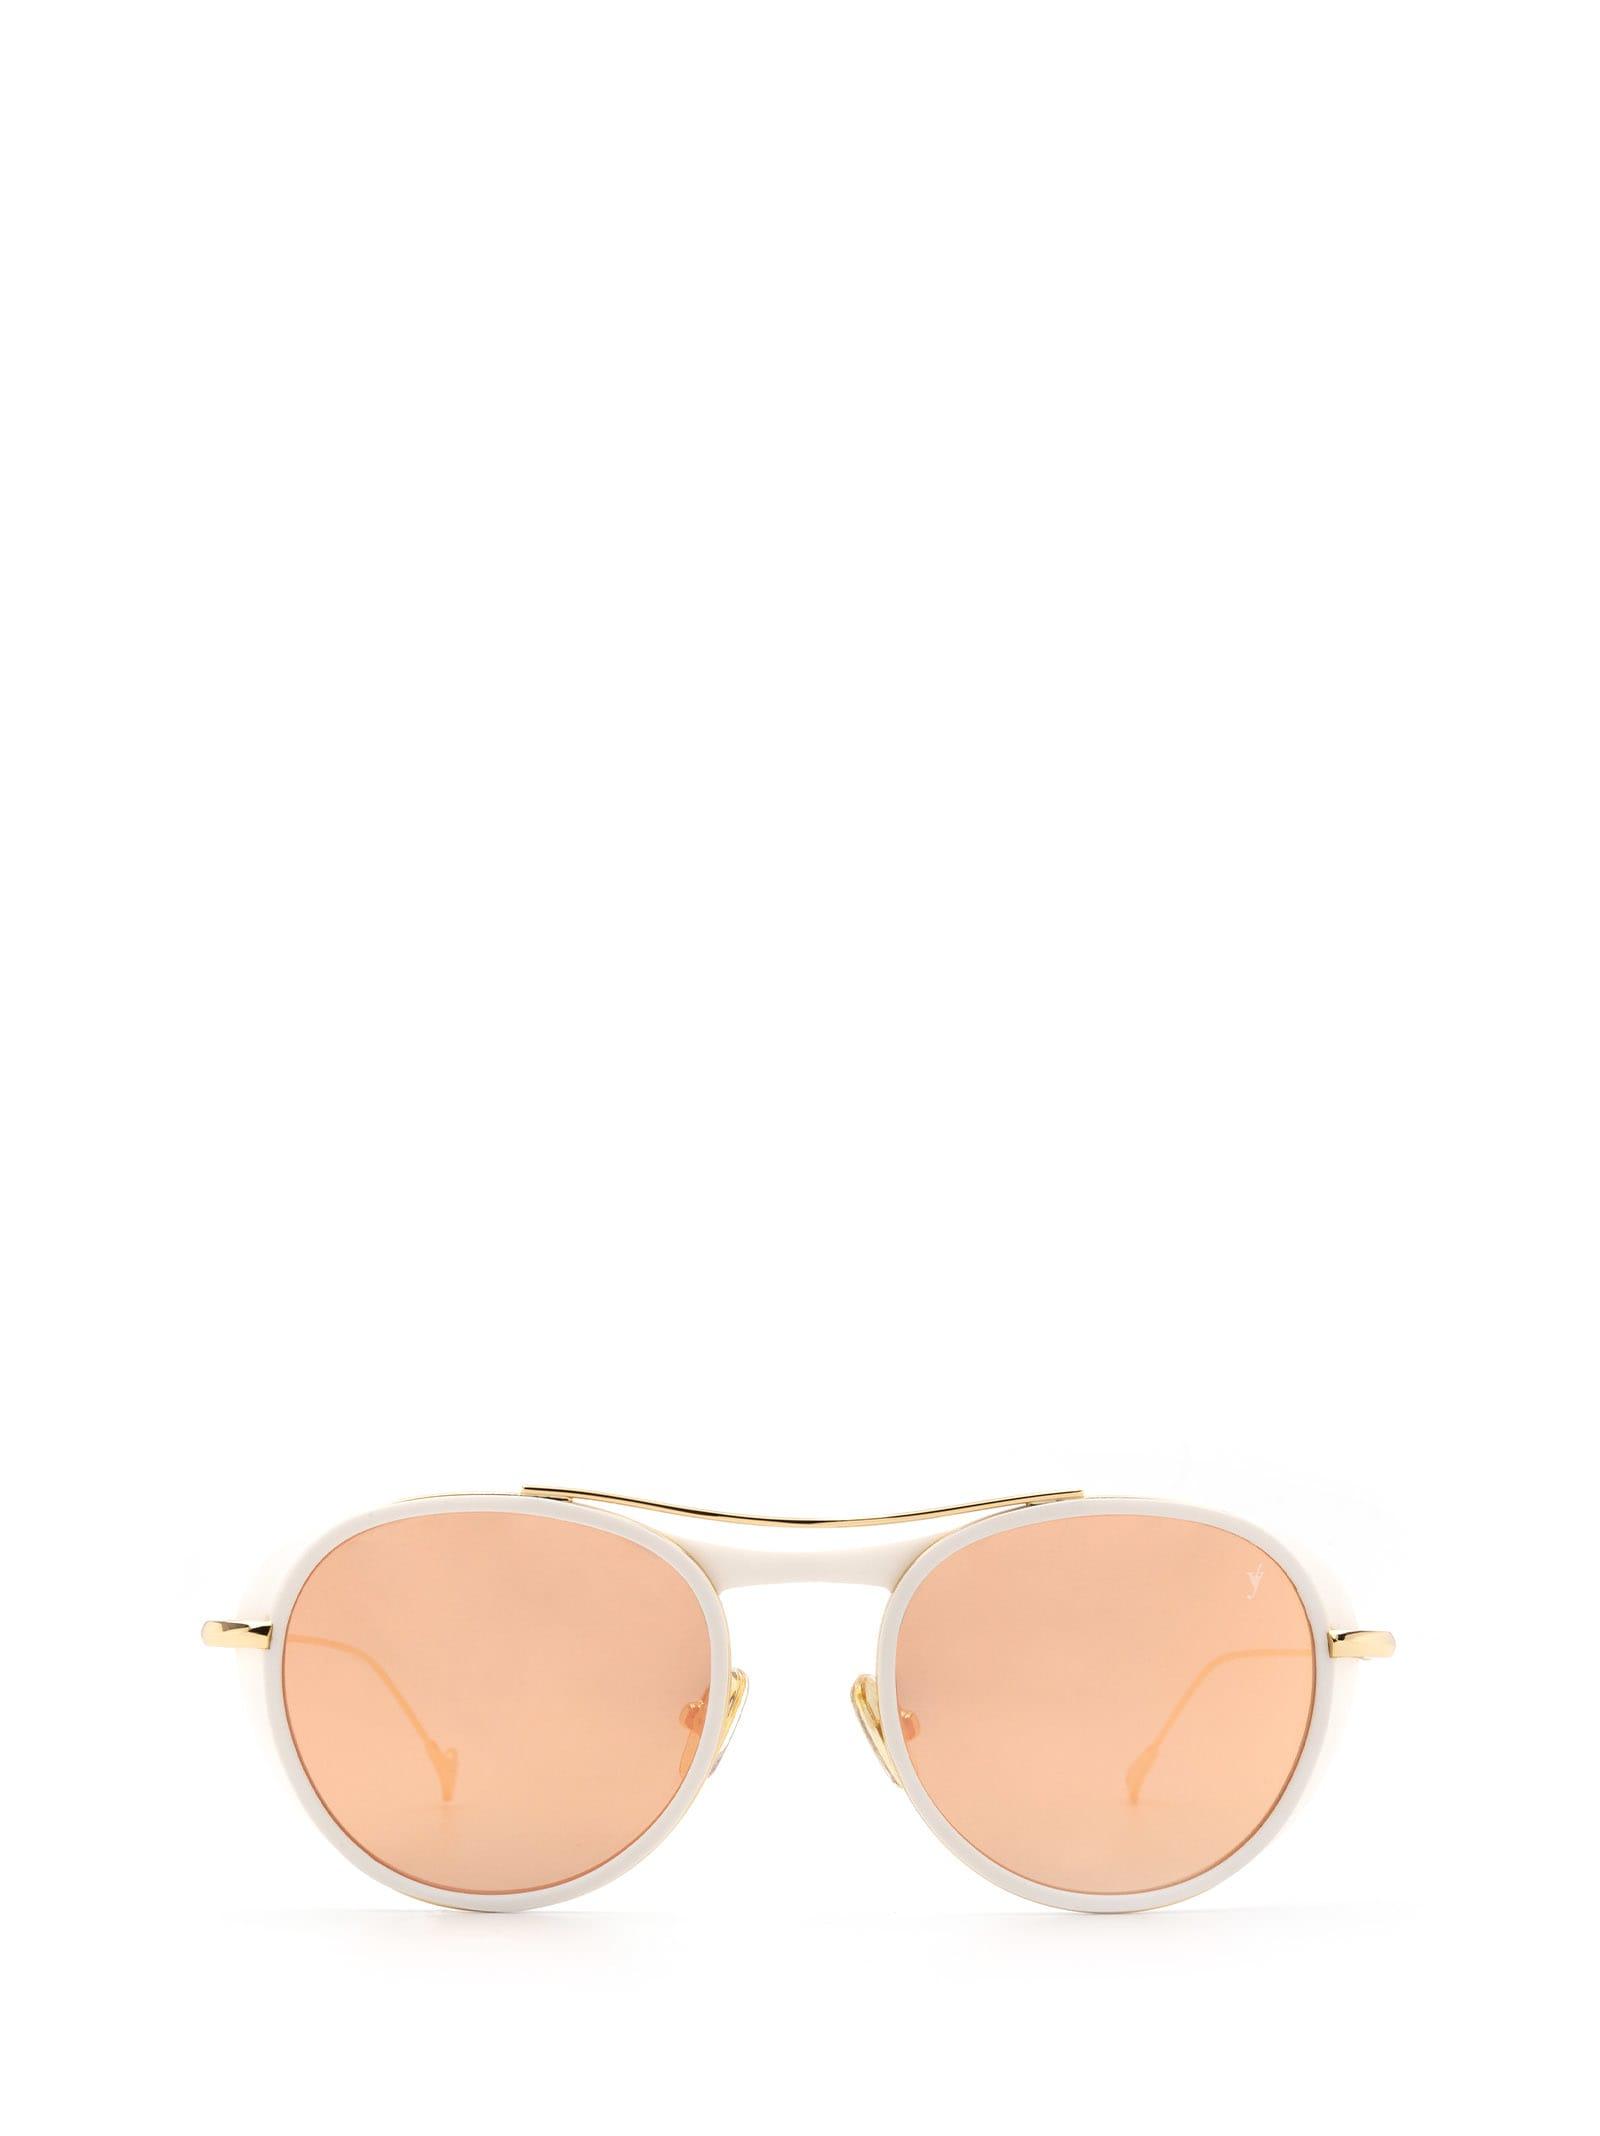 Eyepetizer Eyepetizer Marlon C.l-4-8c Sunglasses